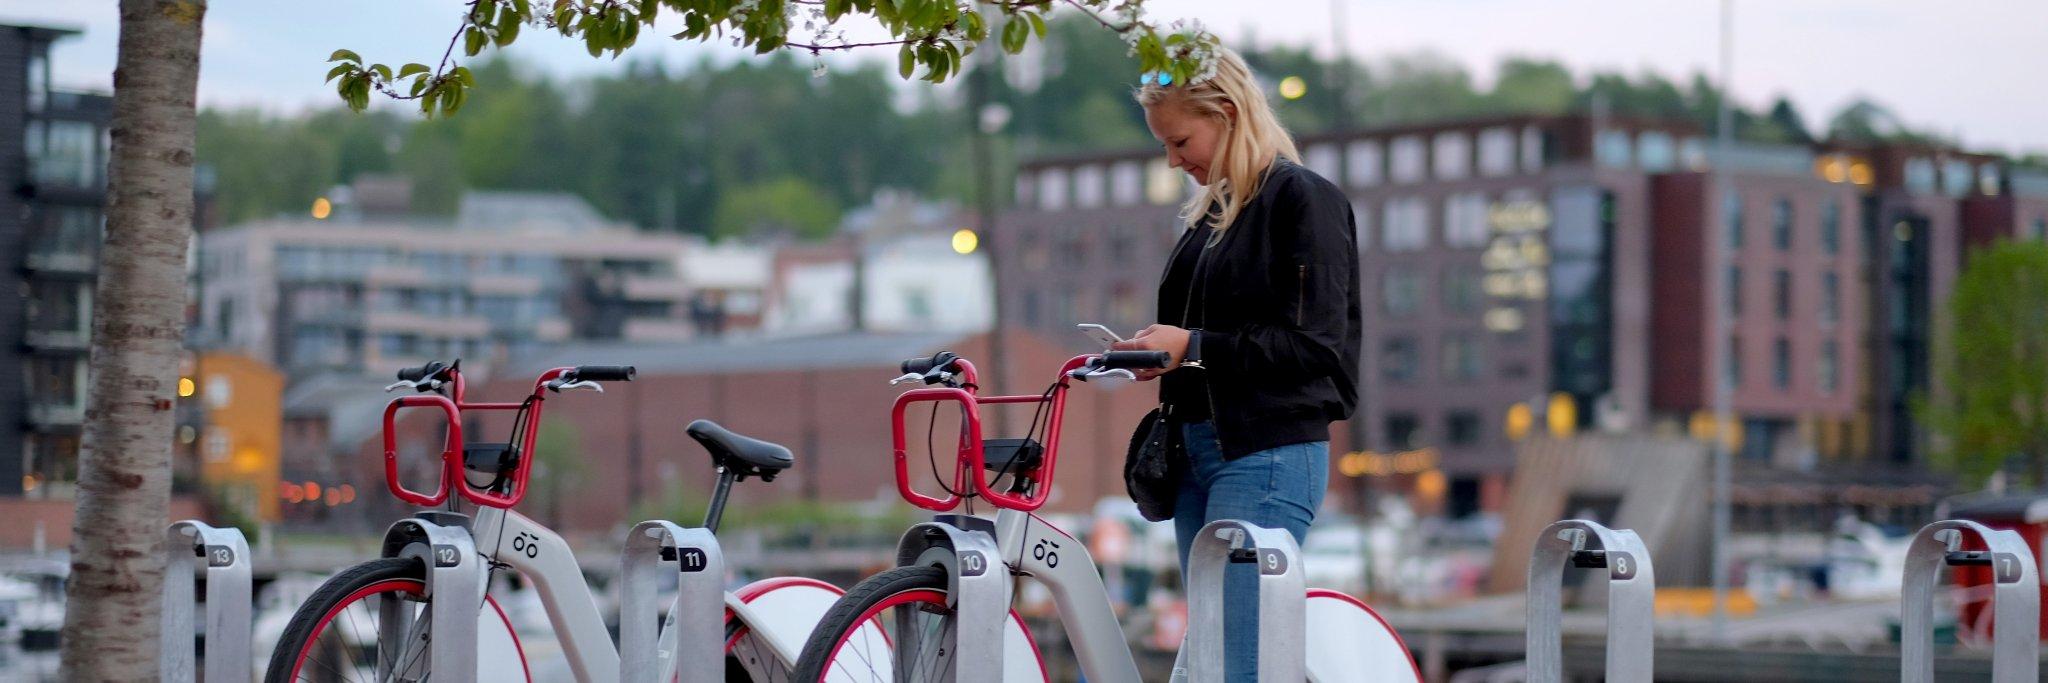 Urban Sharing awarded €1m funding for micromobility R&D 🤓🛴🌱linkedin.com/pulse/urban-sh…